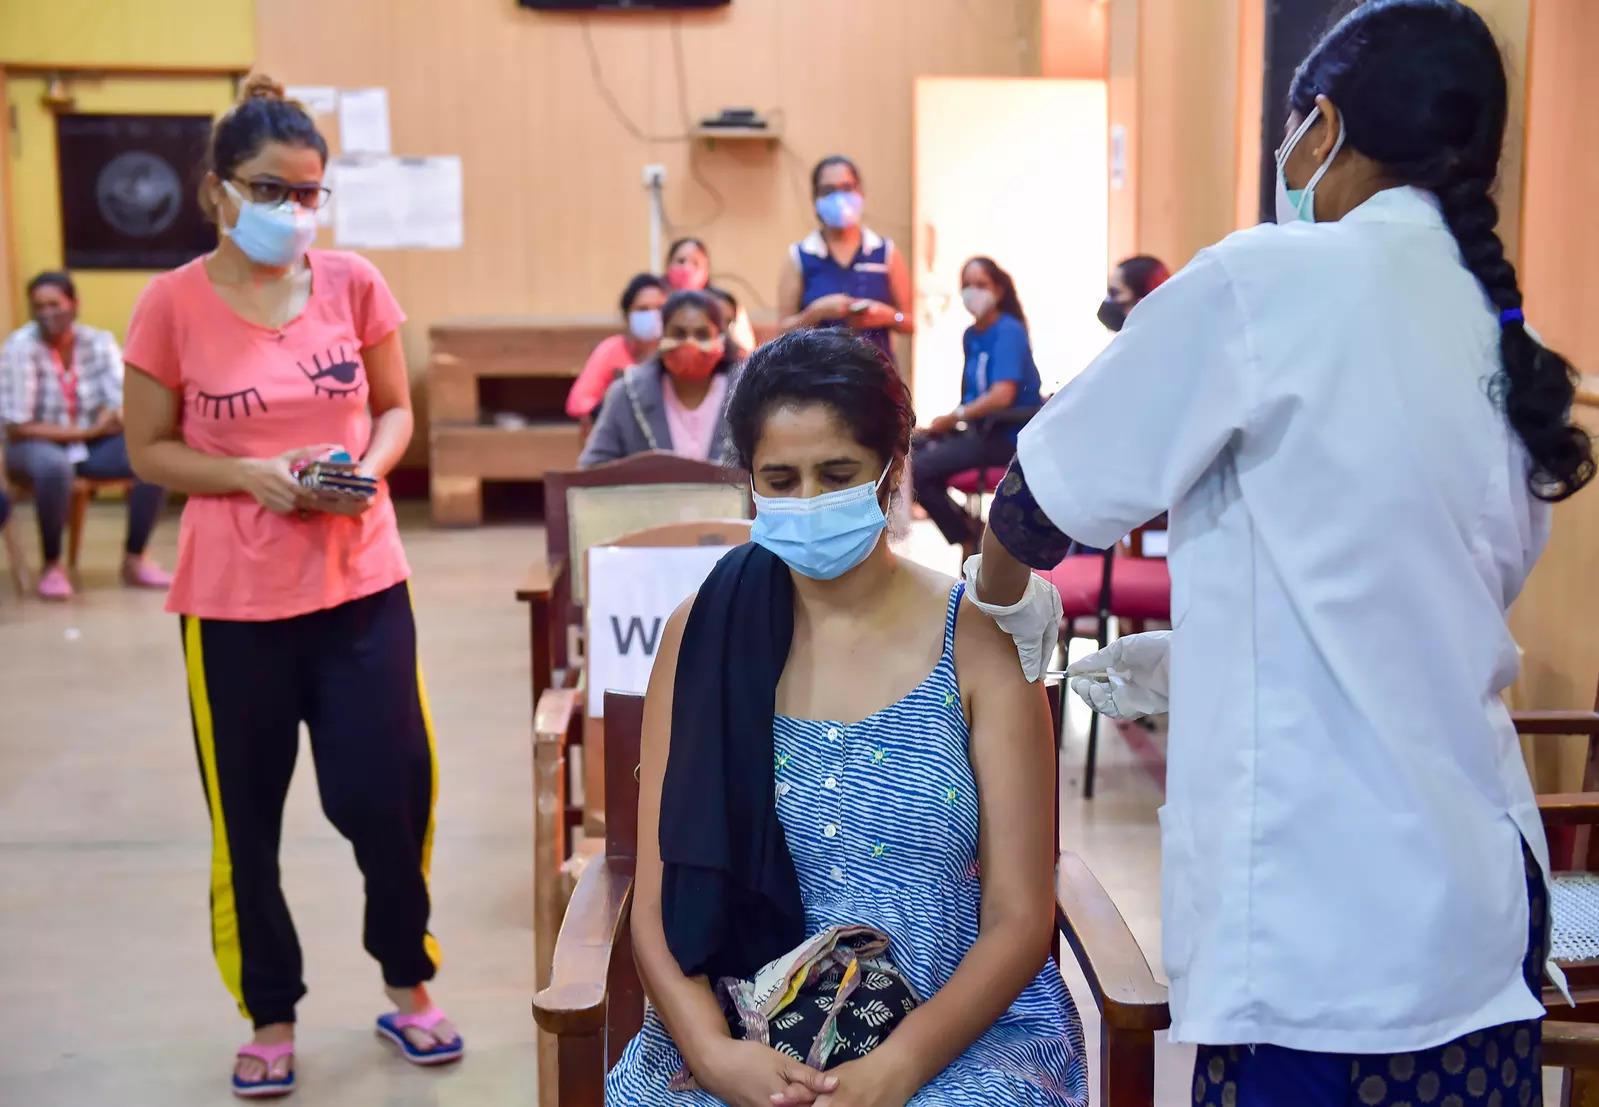 Expedite Covid vaccination drive, says IMA president